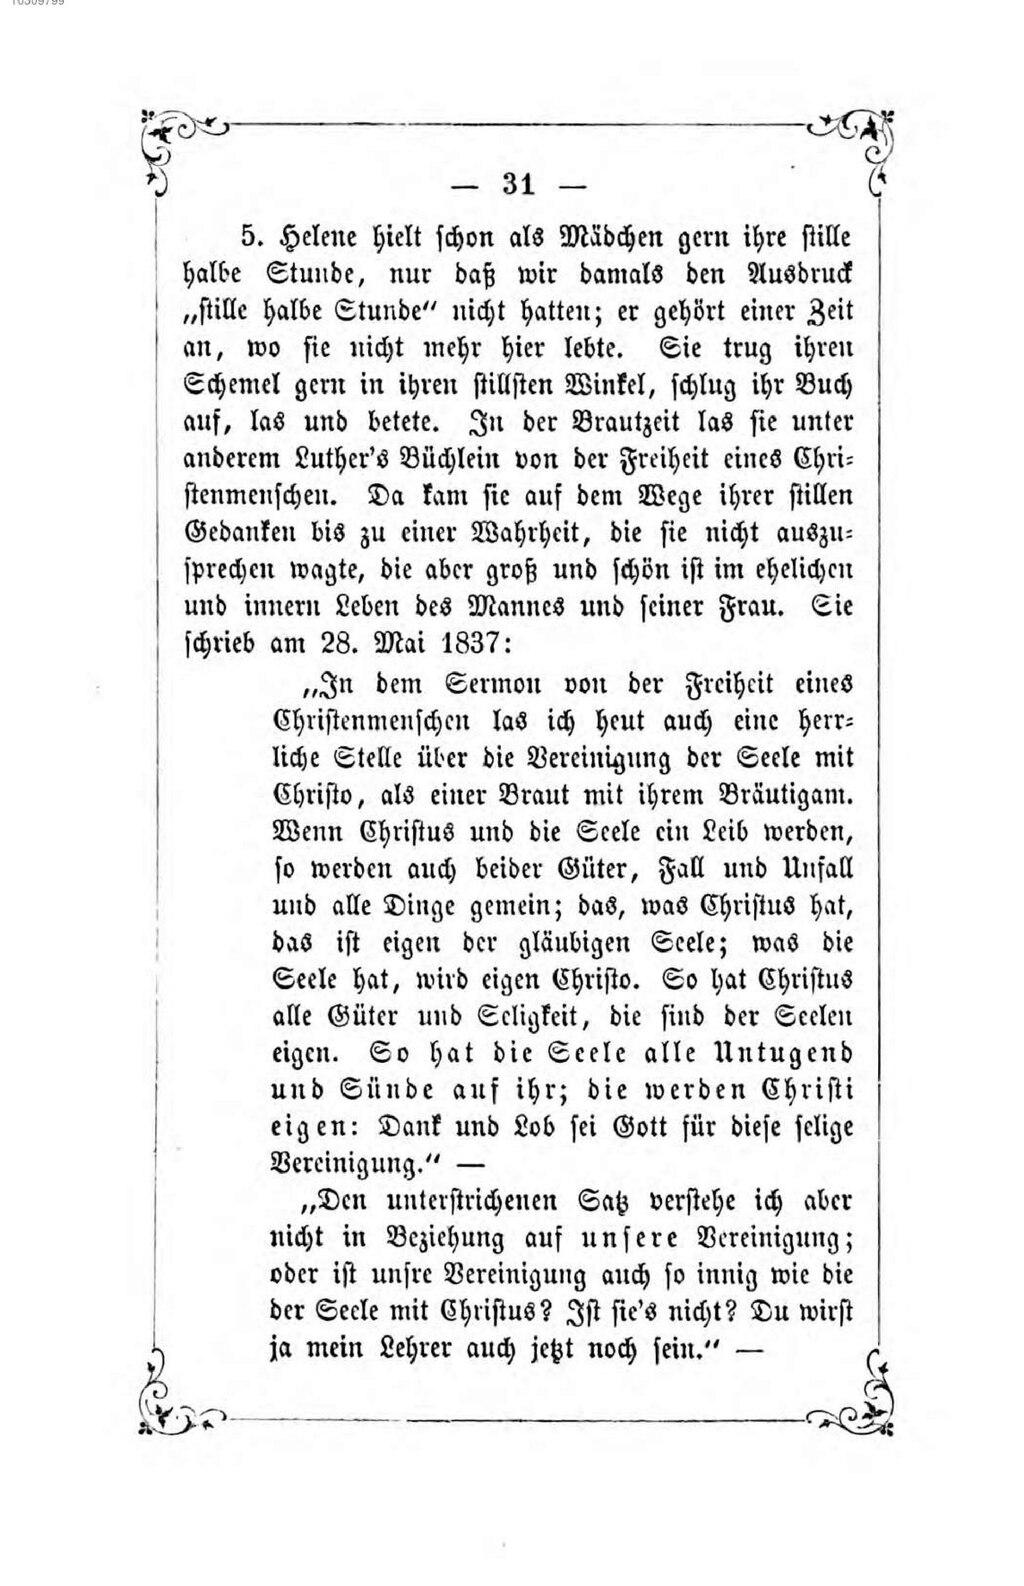 Großartig Bosch Schablonenführer Galerie - Entry Level Resume ...